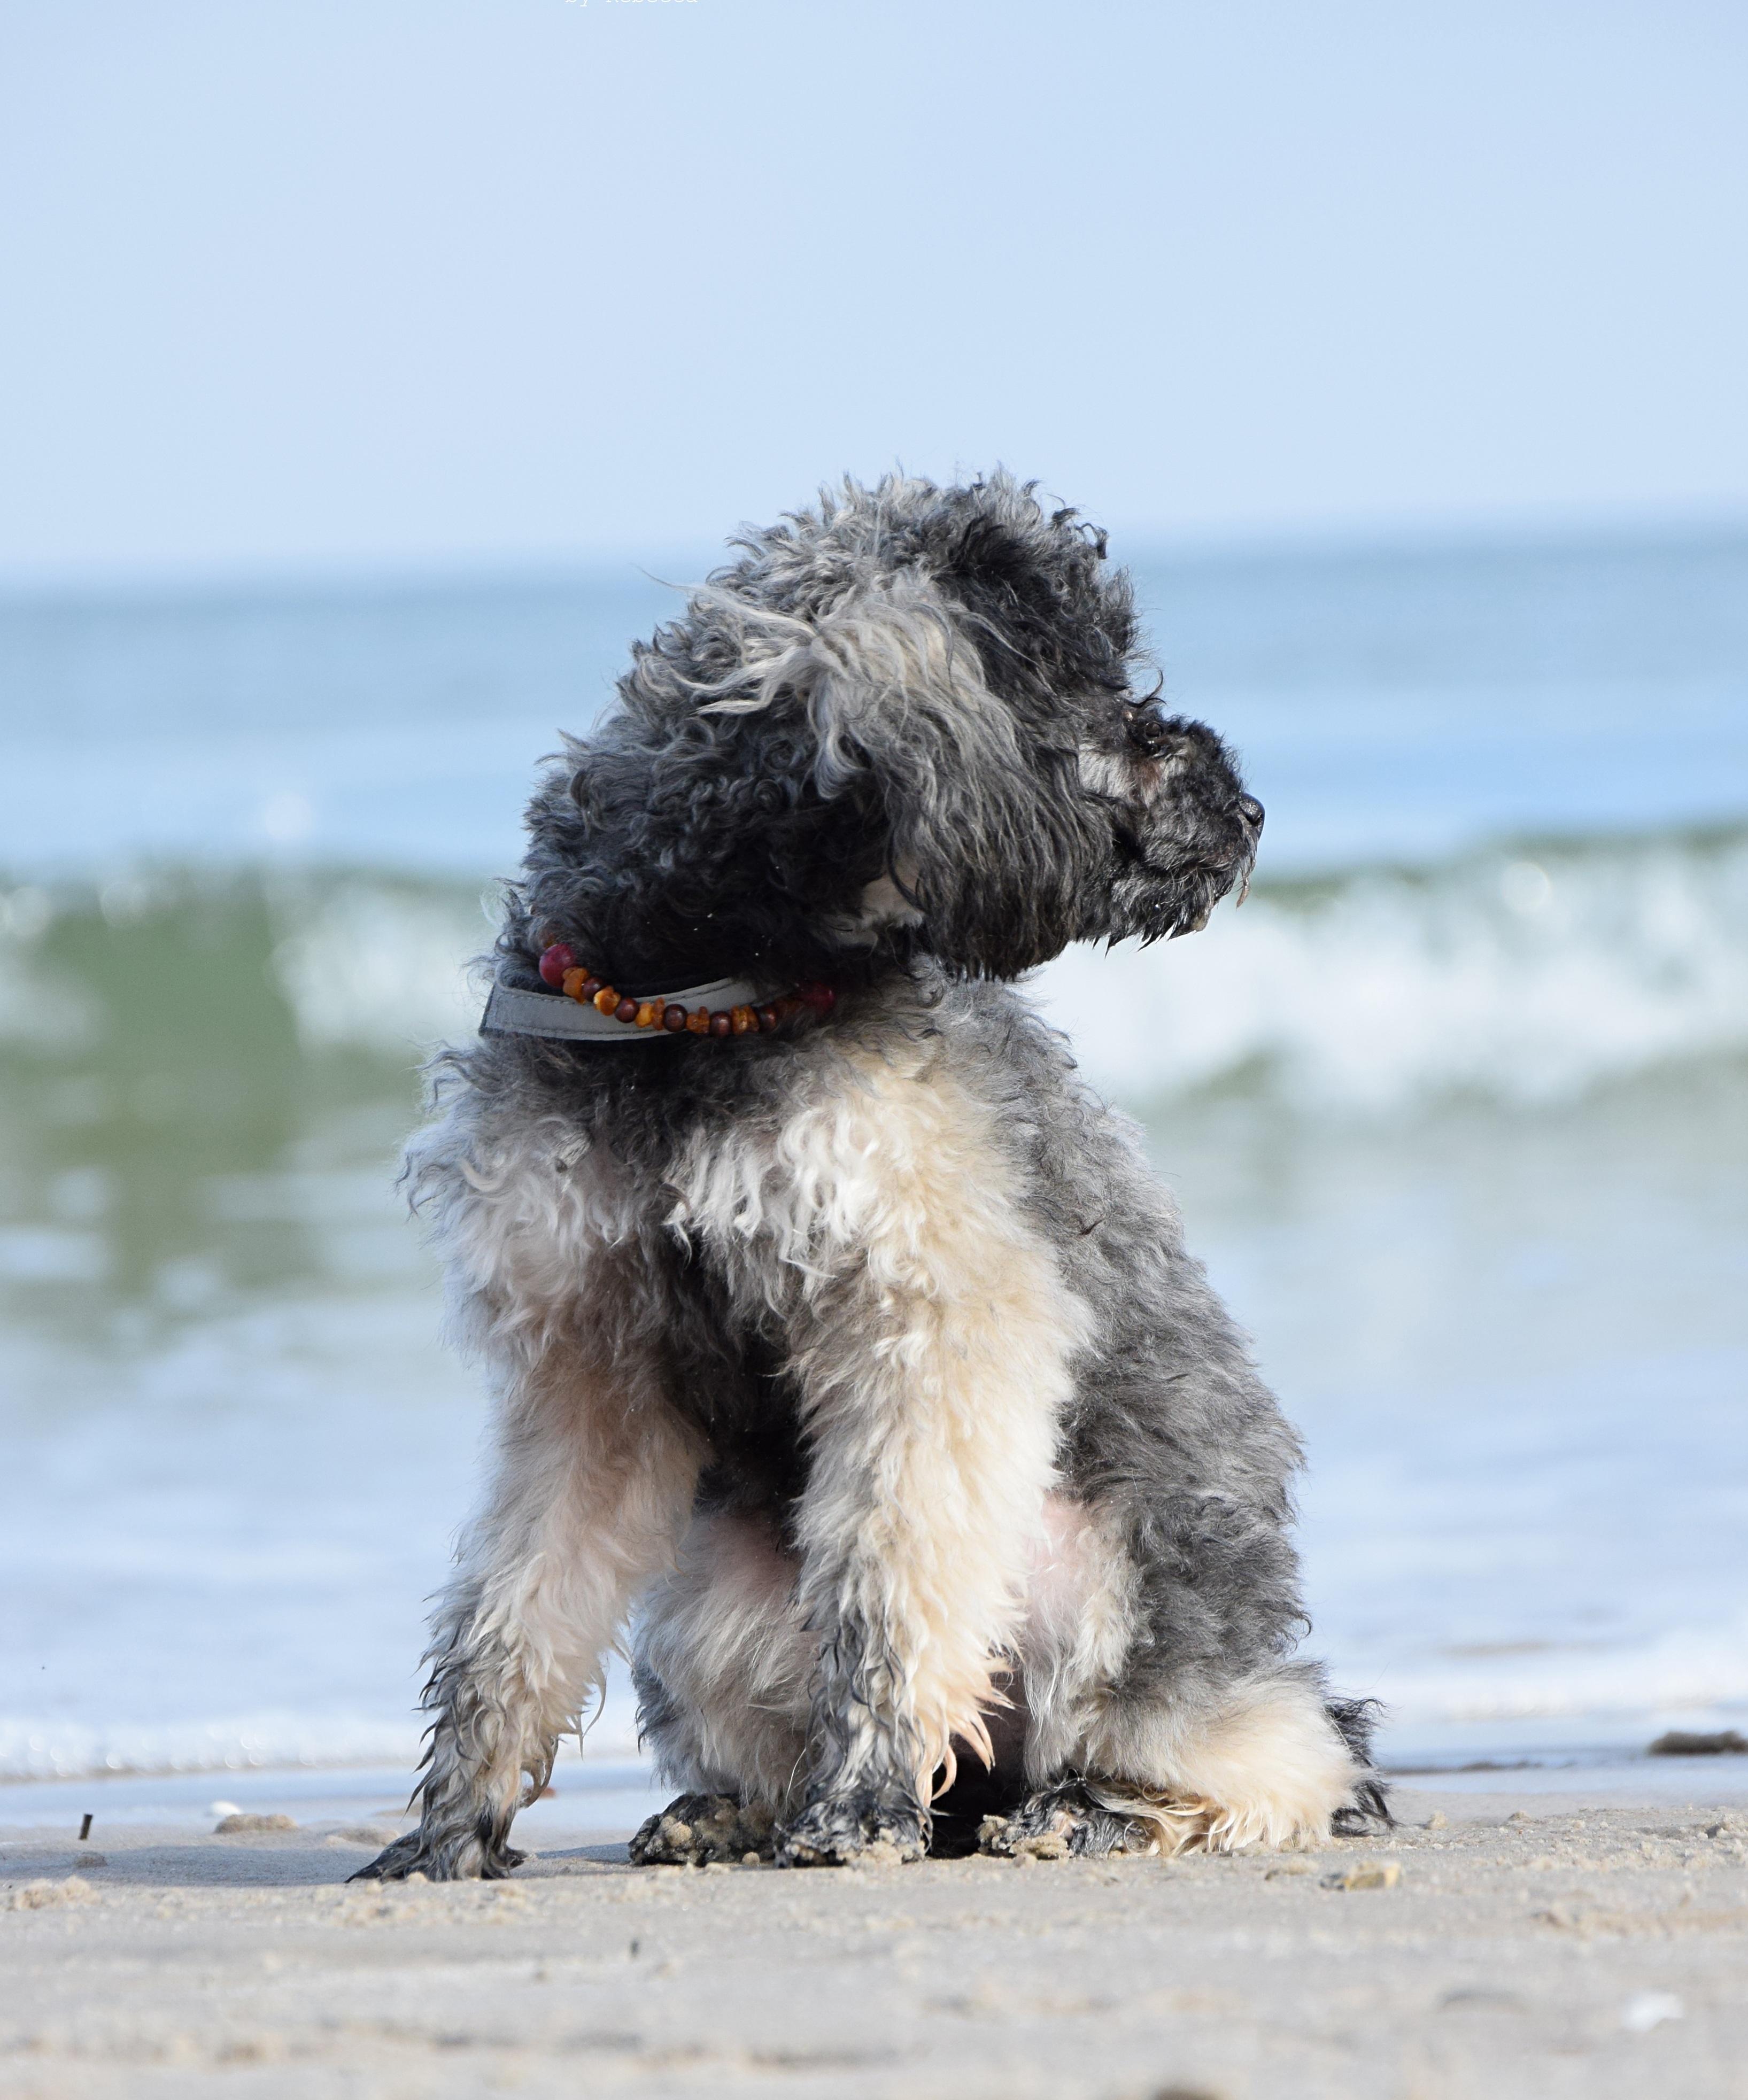 Kostenlose foto : Strand, Meer, Wasser, Welle, Pudel, Wirbeltier ...